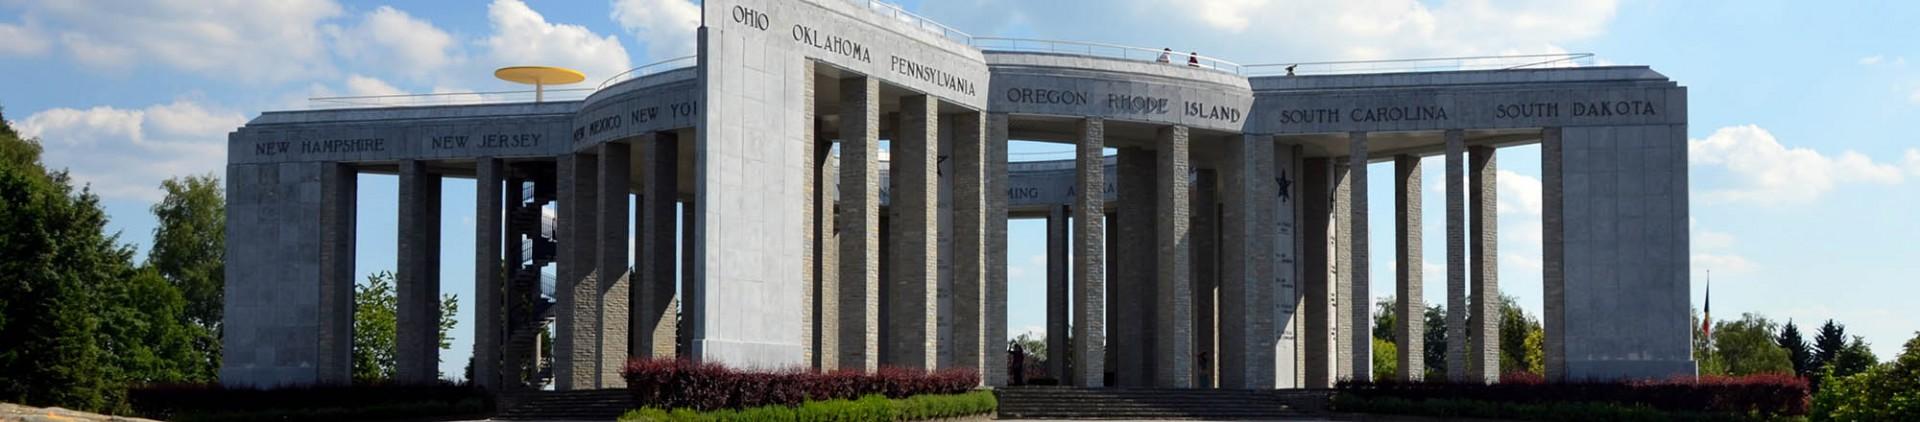 LAND OF MEMORY for groups - Belgium